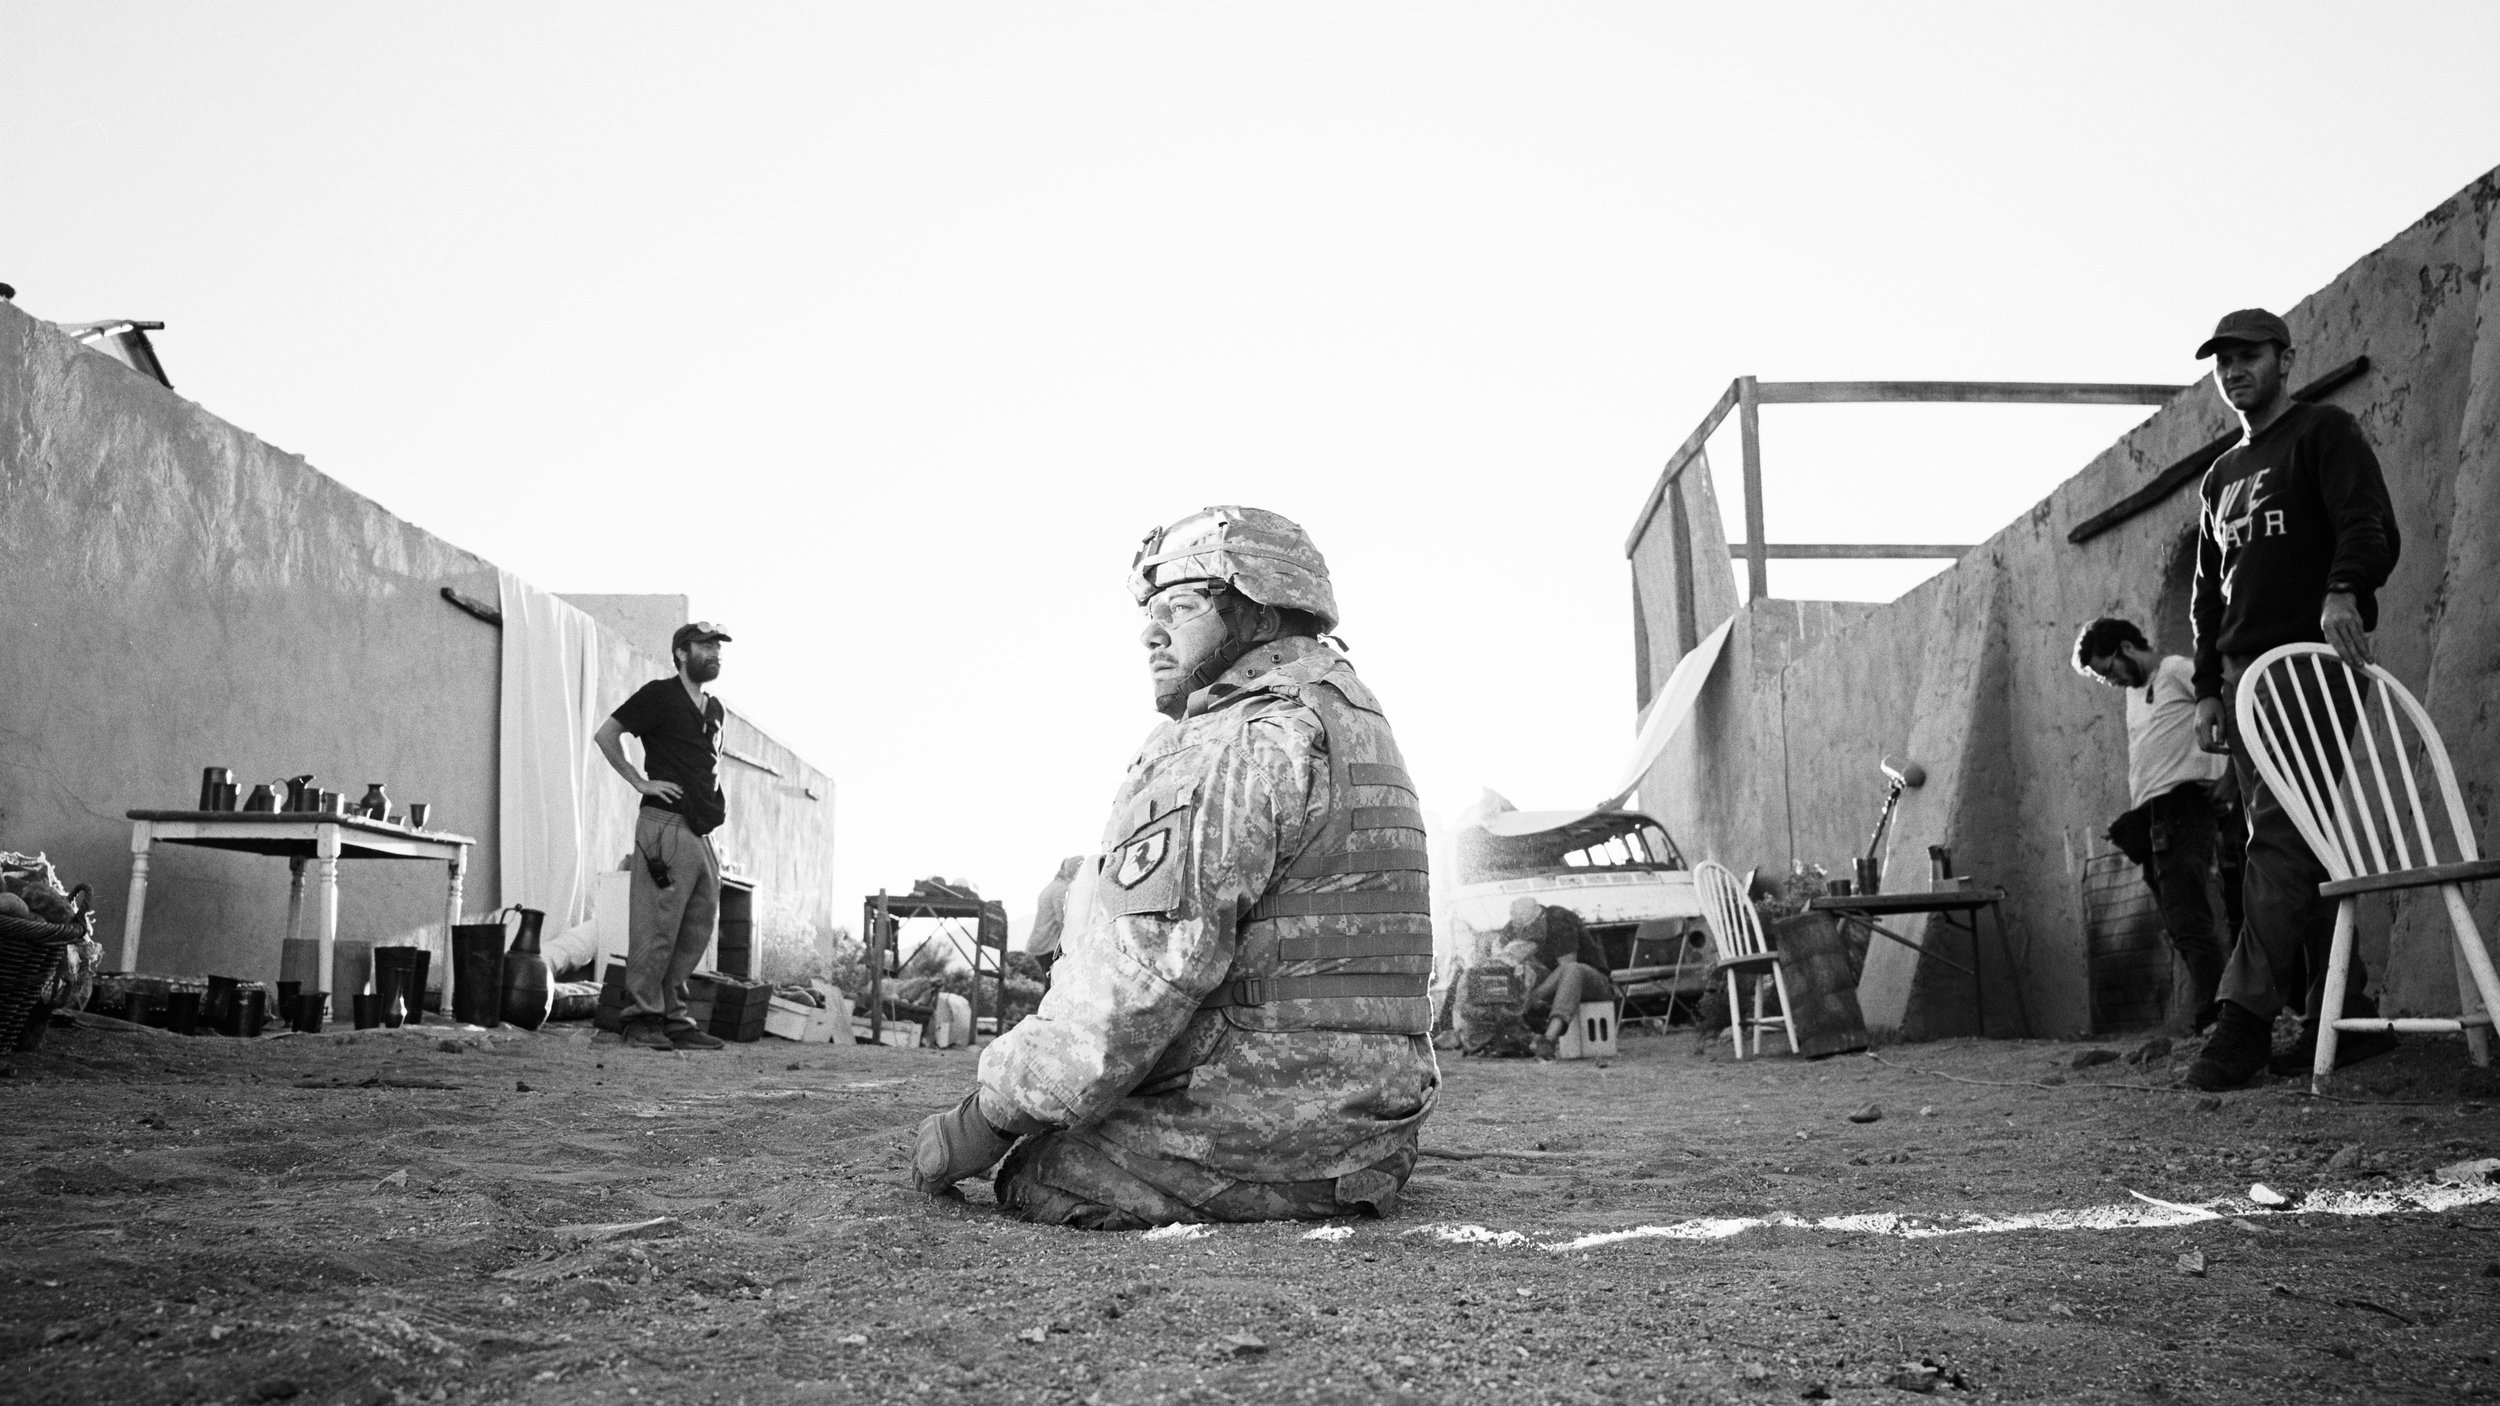 Fort Irwin_26.jpg